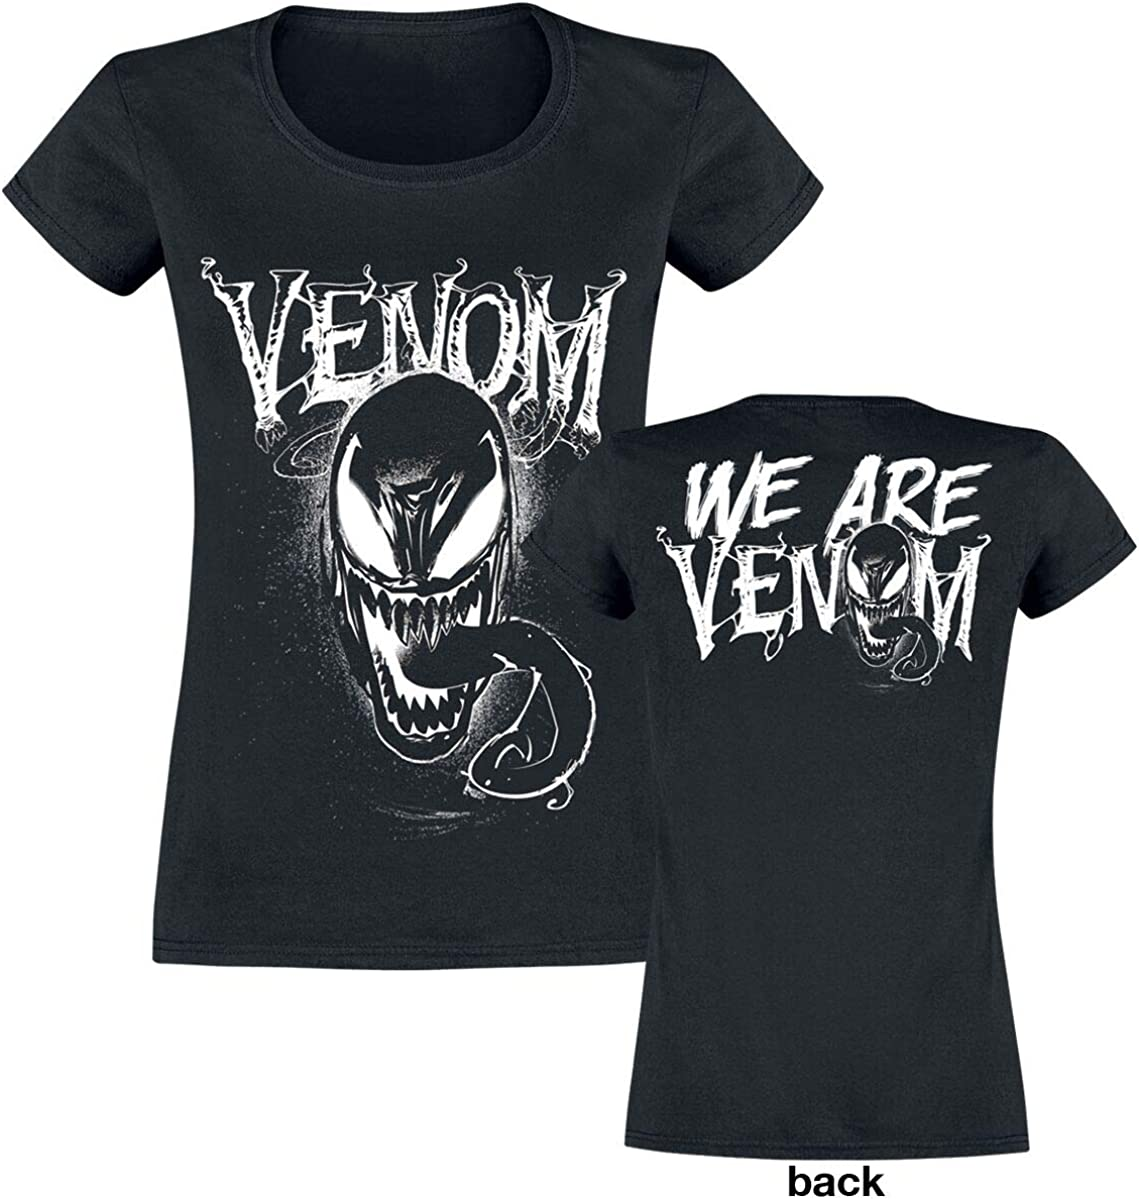 Venom (Marvel) We Are Venom Camiseta Negro